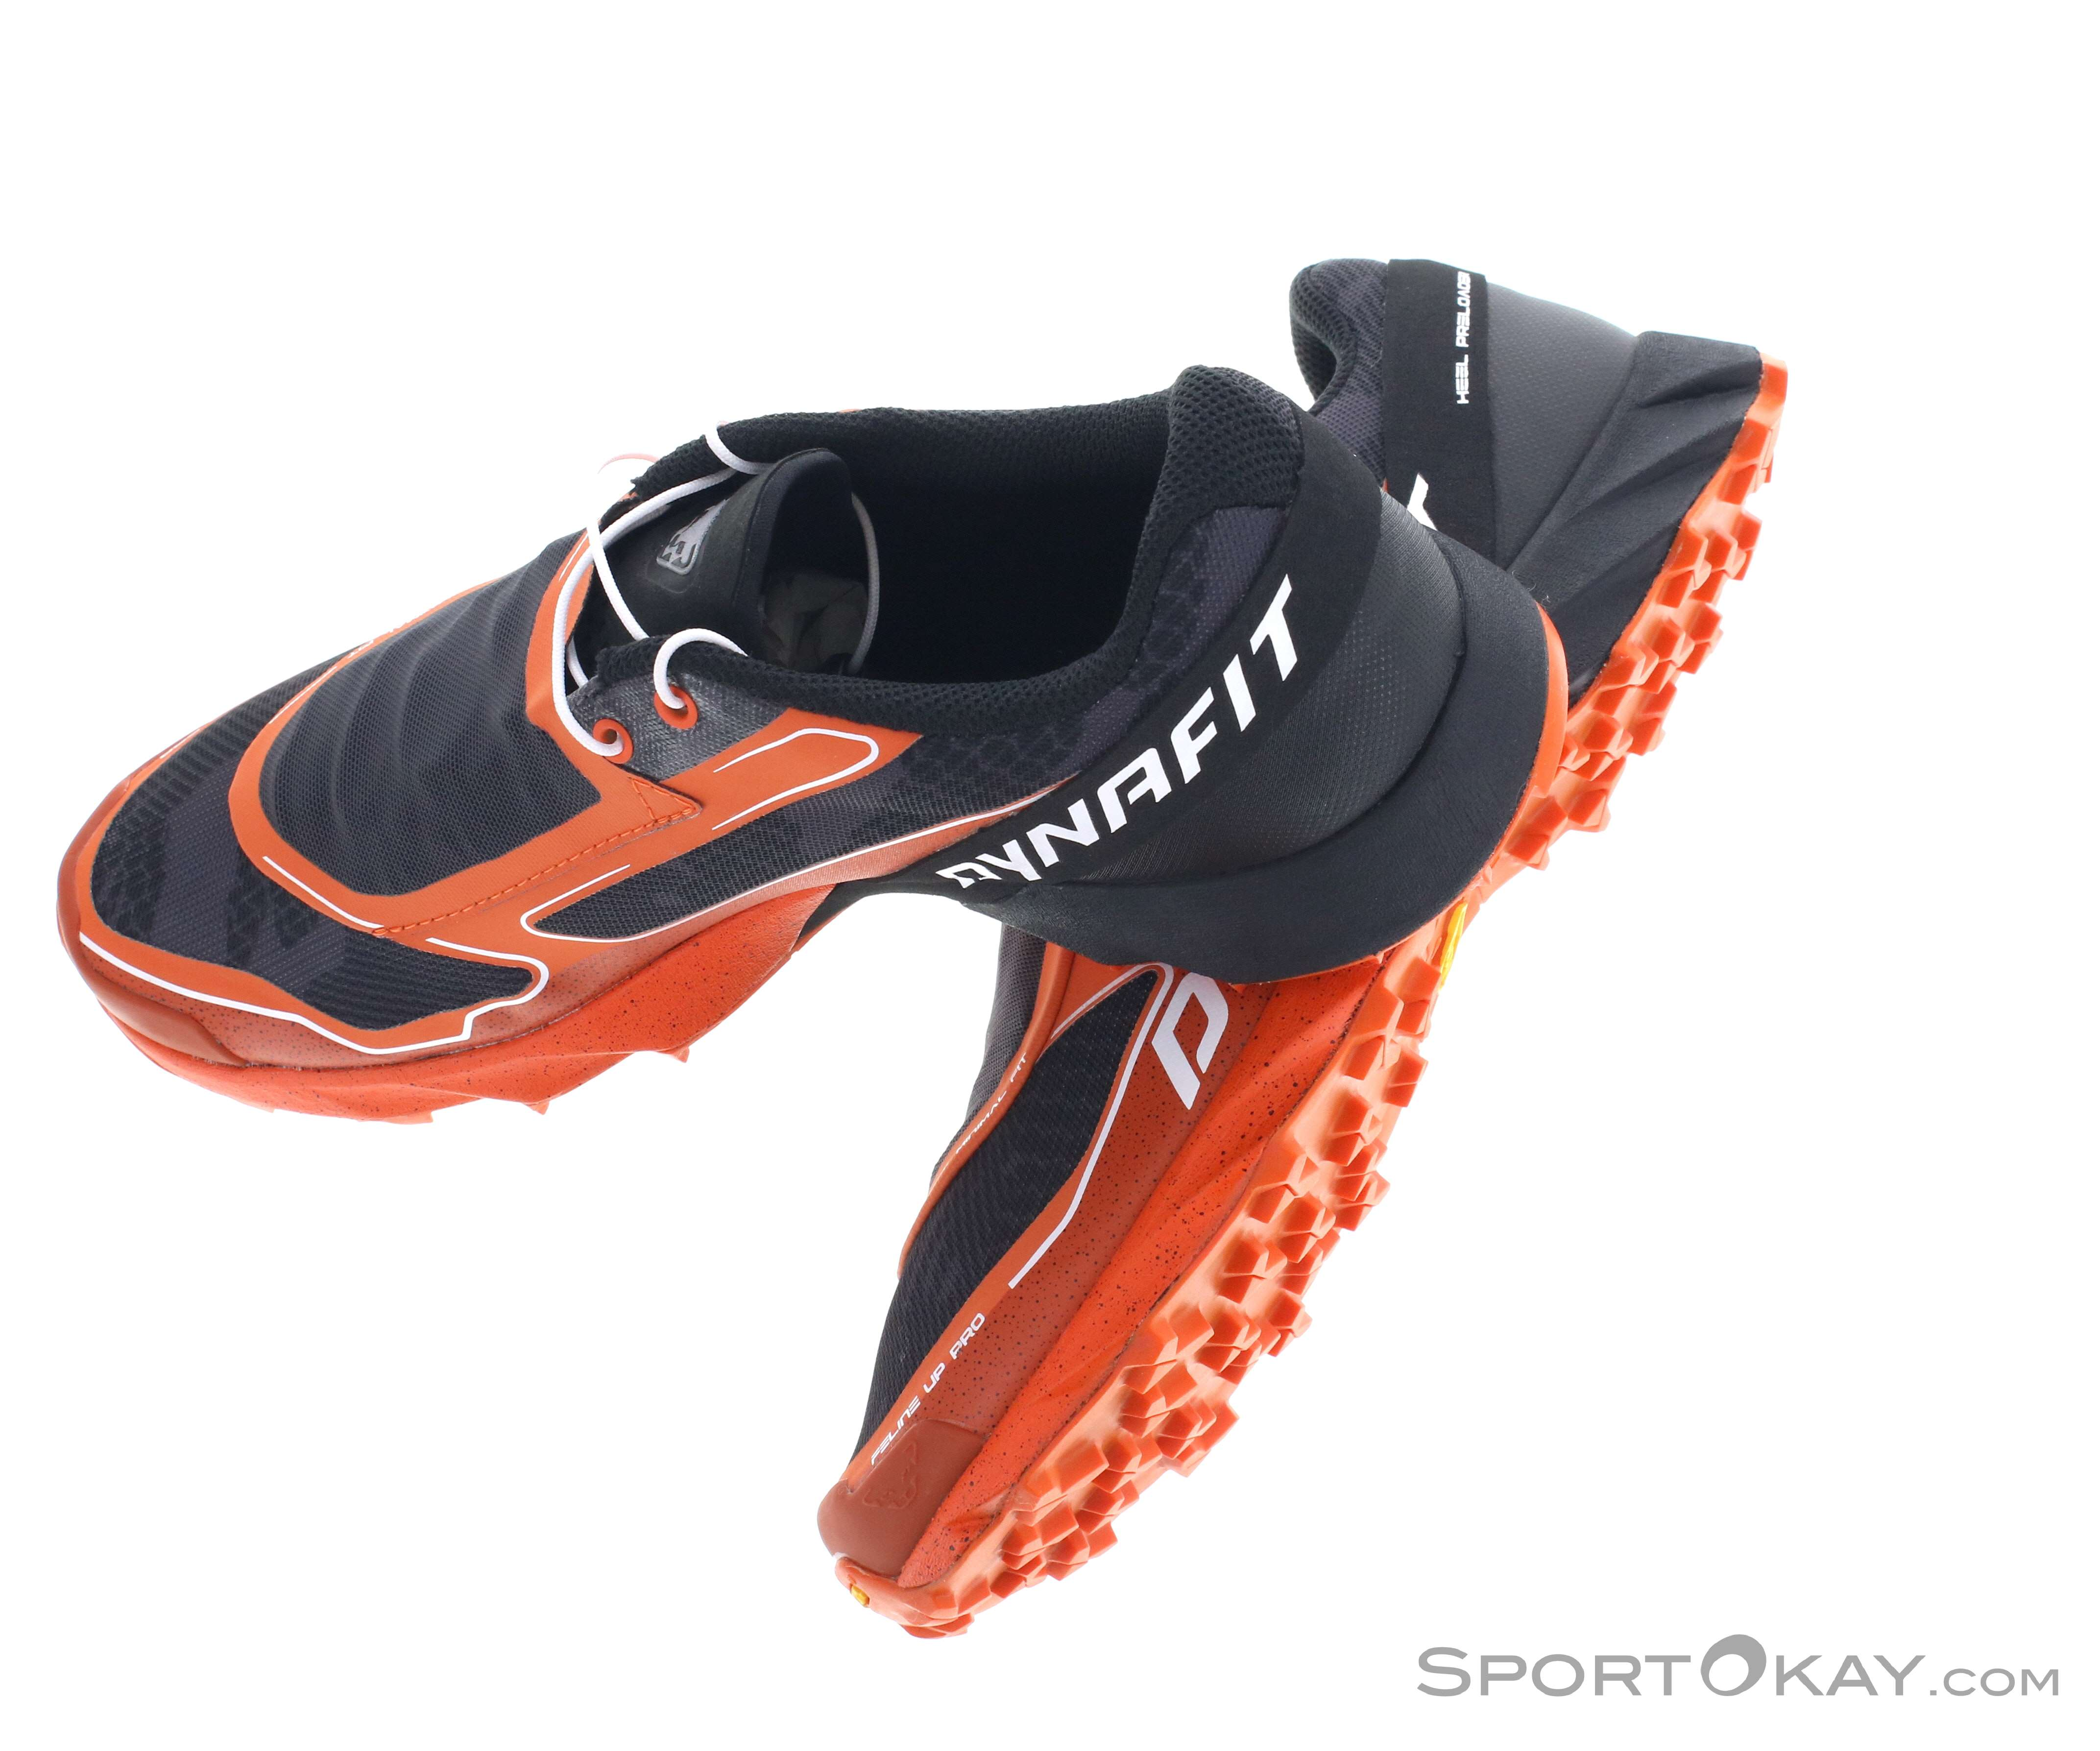 aadc2cea5f Dynafit Feline Up Pro Unisex Trail Running Shoes - Trail Running ...